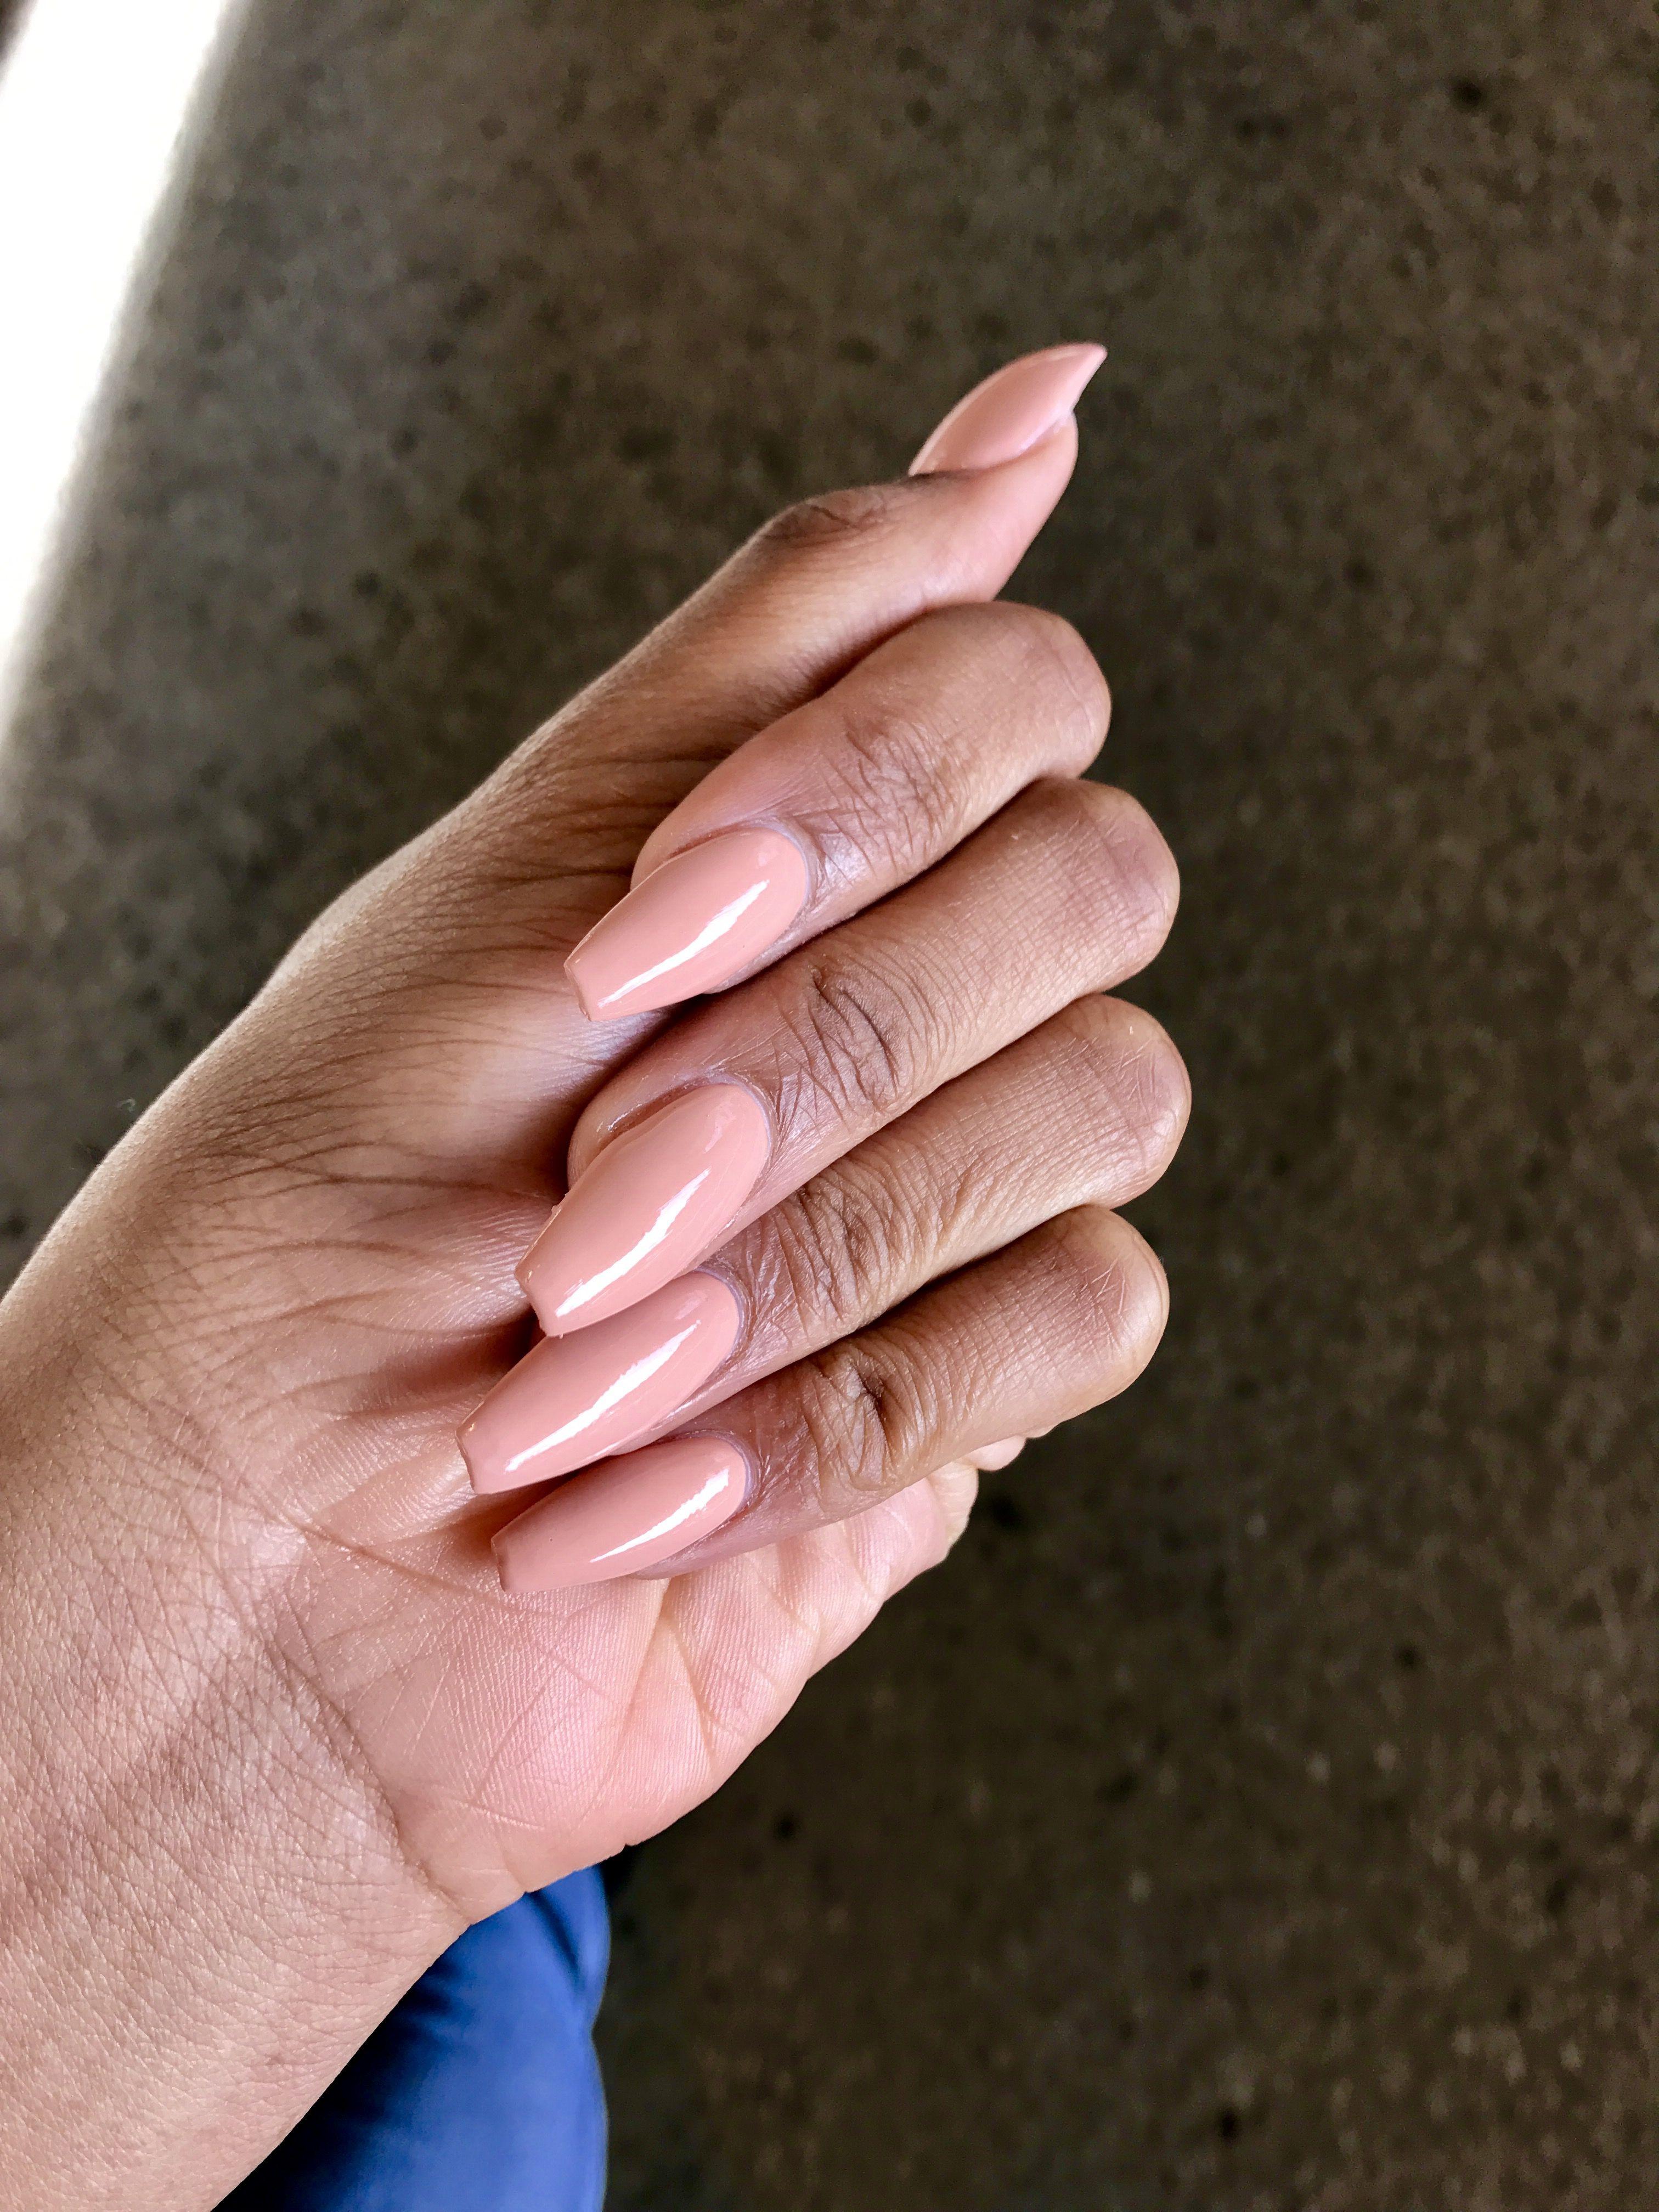 68 Ideas Nails Acrylic Spring Dark Skin For 2019 Nail Colors Summer Nails Colors Cute Spring Nails